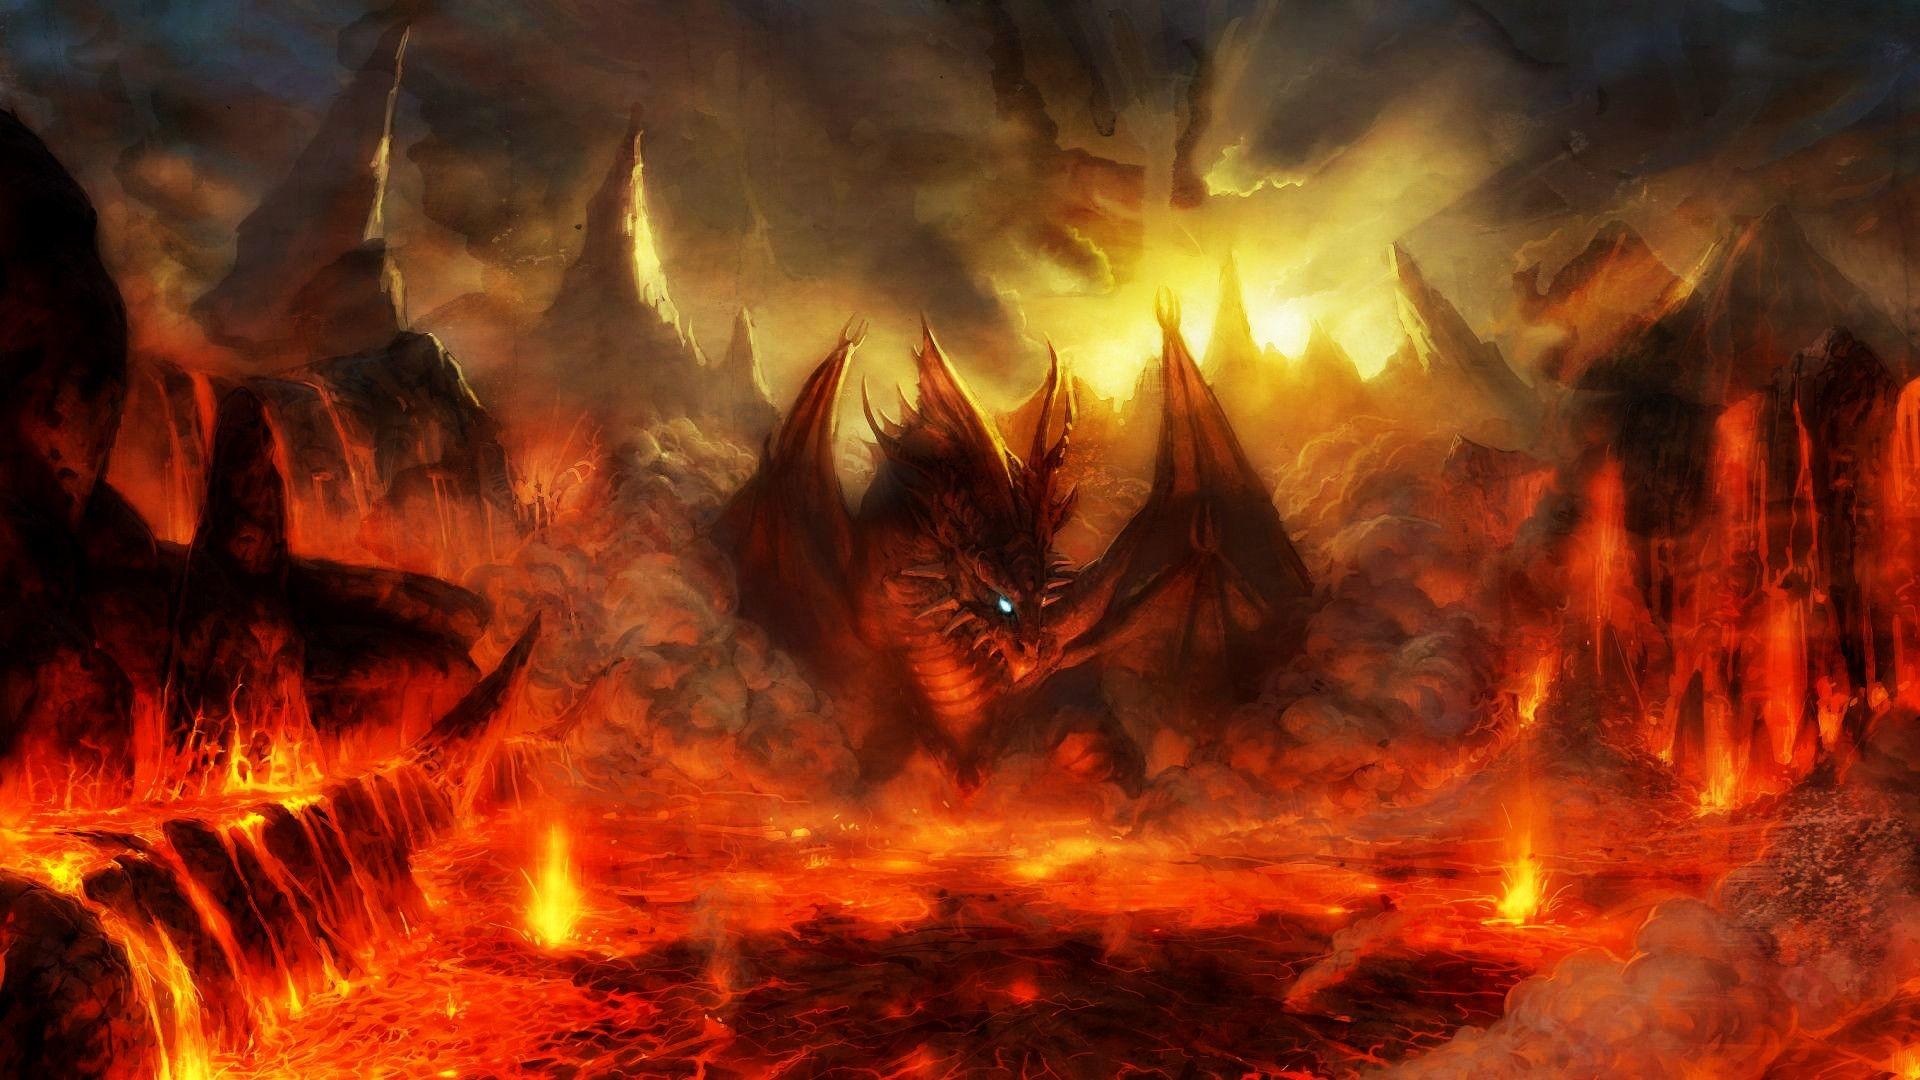 heaven vs hell wallpaper  68  images